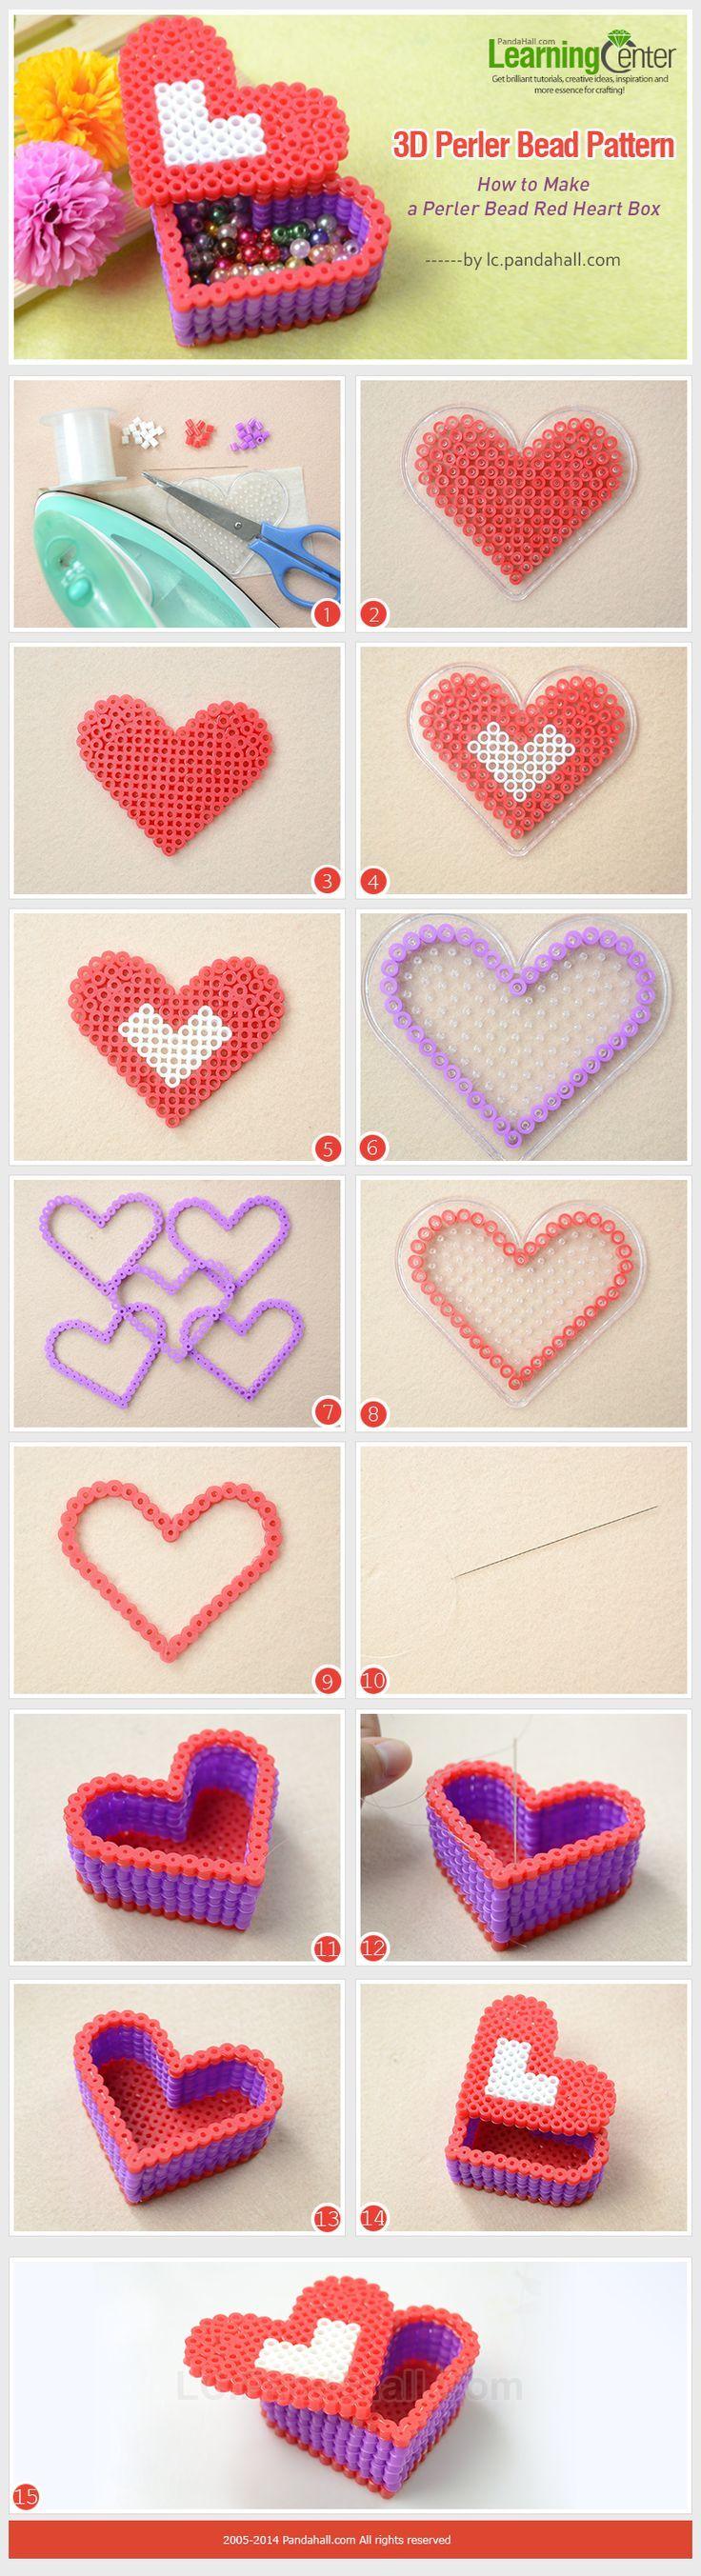 DIY: How to Make a 3D Perler Bead Red Heart Box